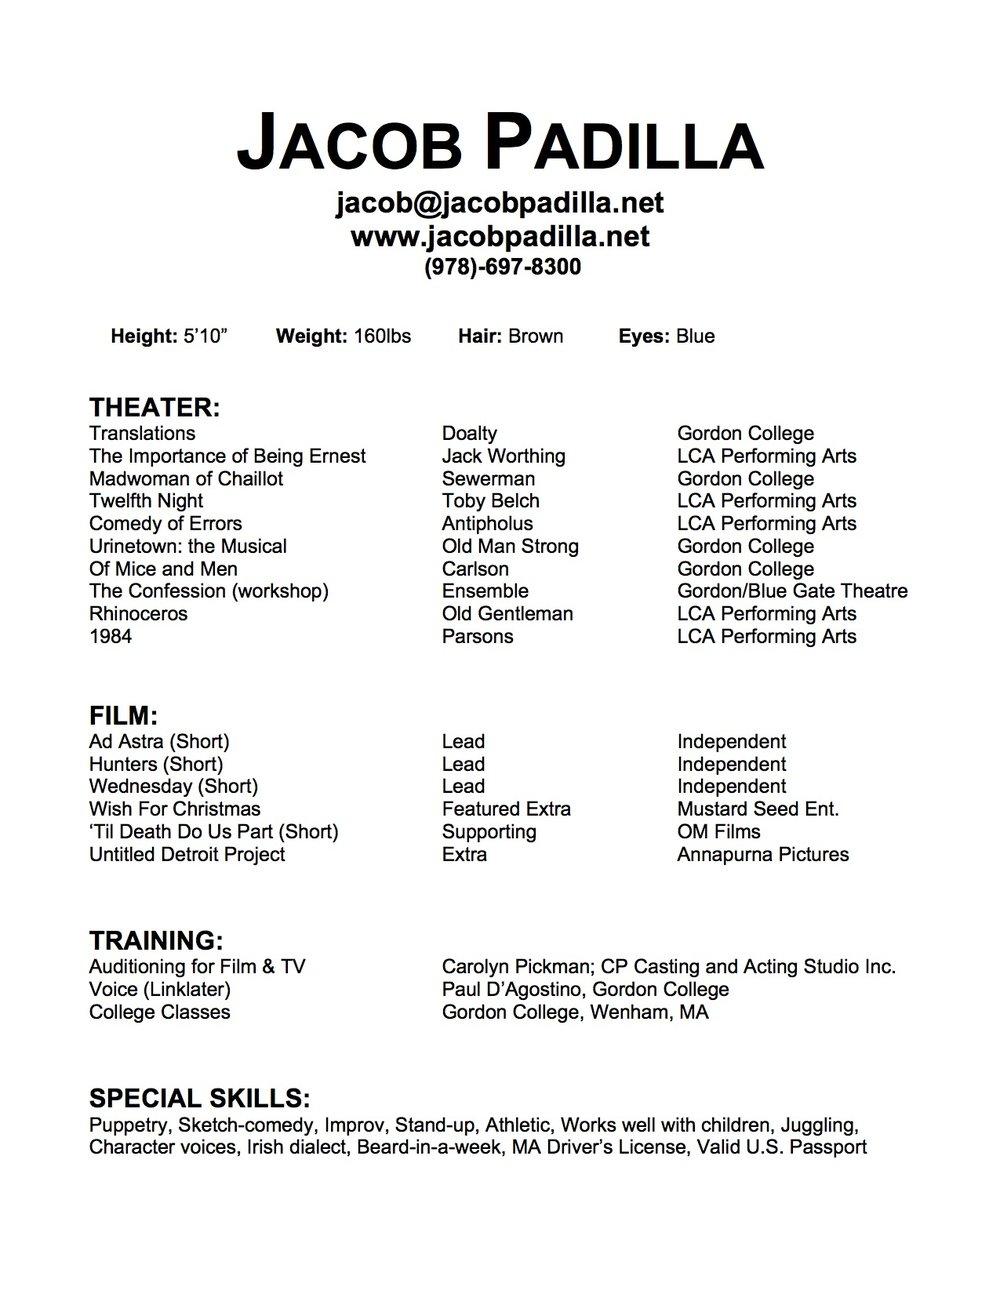 Resume Jacob Padilla